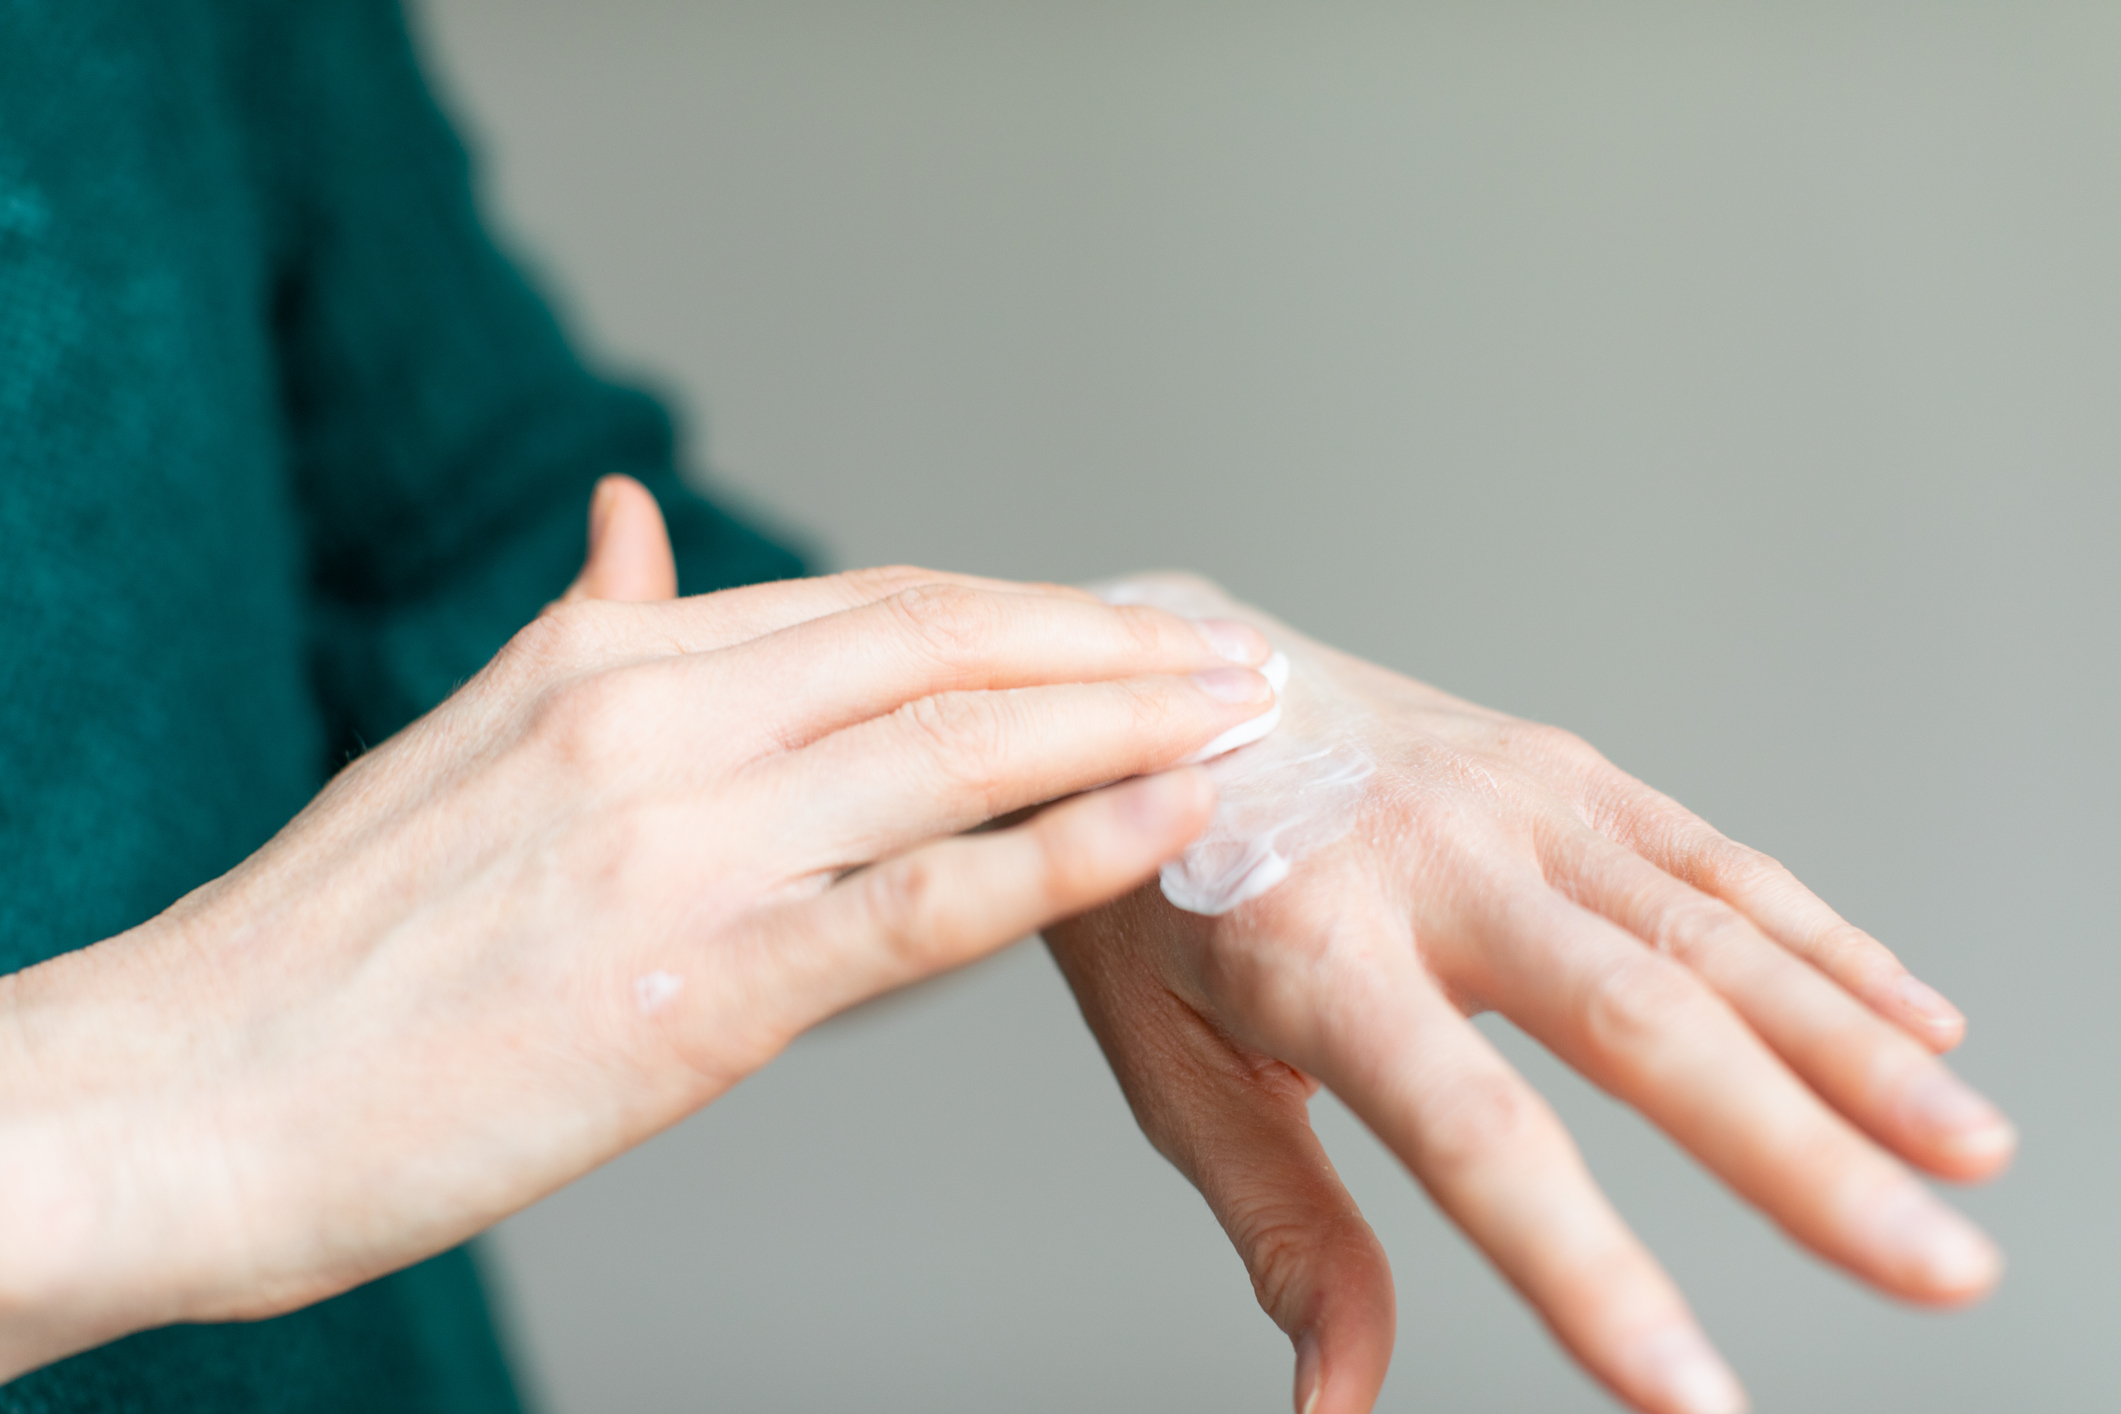 Dry skin amid the coronavirus pandemic, winter: Tips to avoid making it worse